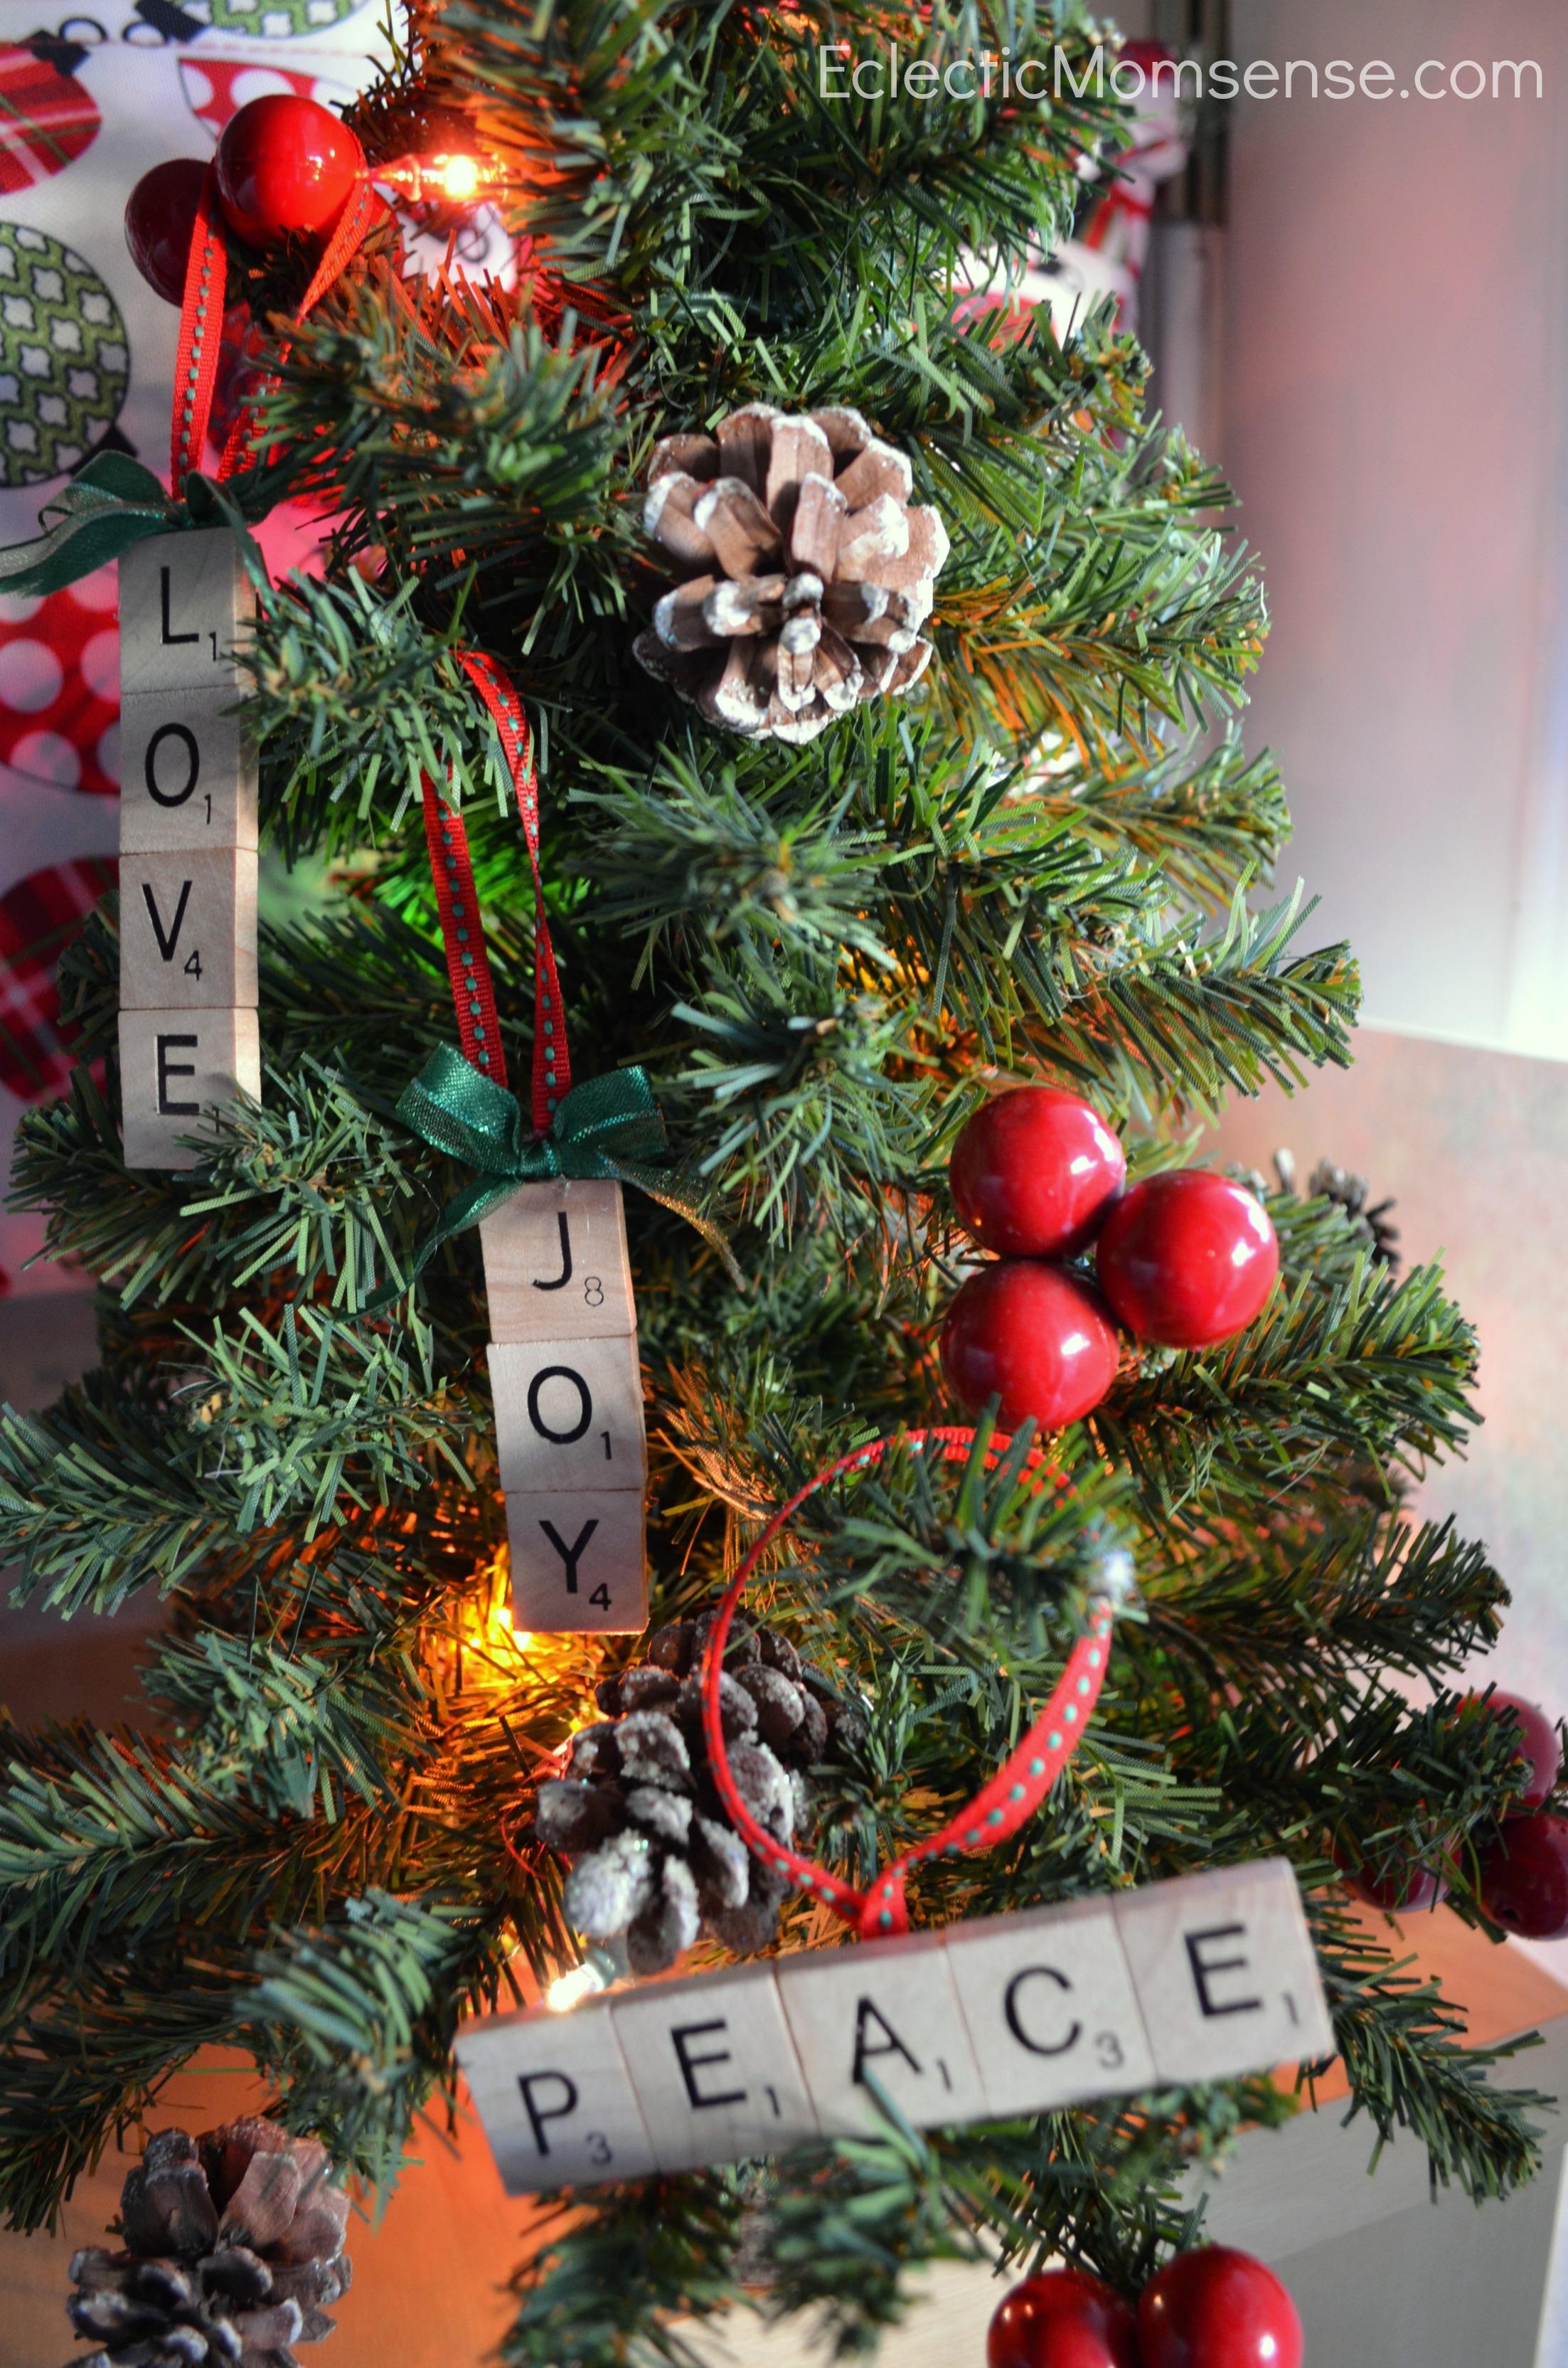 Personalized name ornaments - Scrabble Ornaments